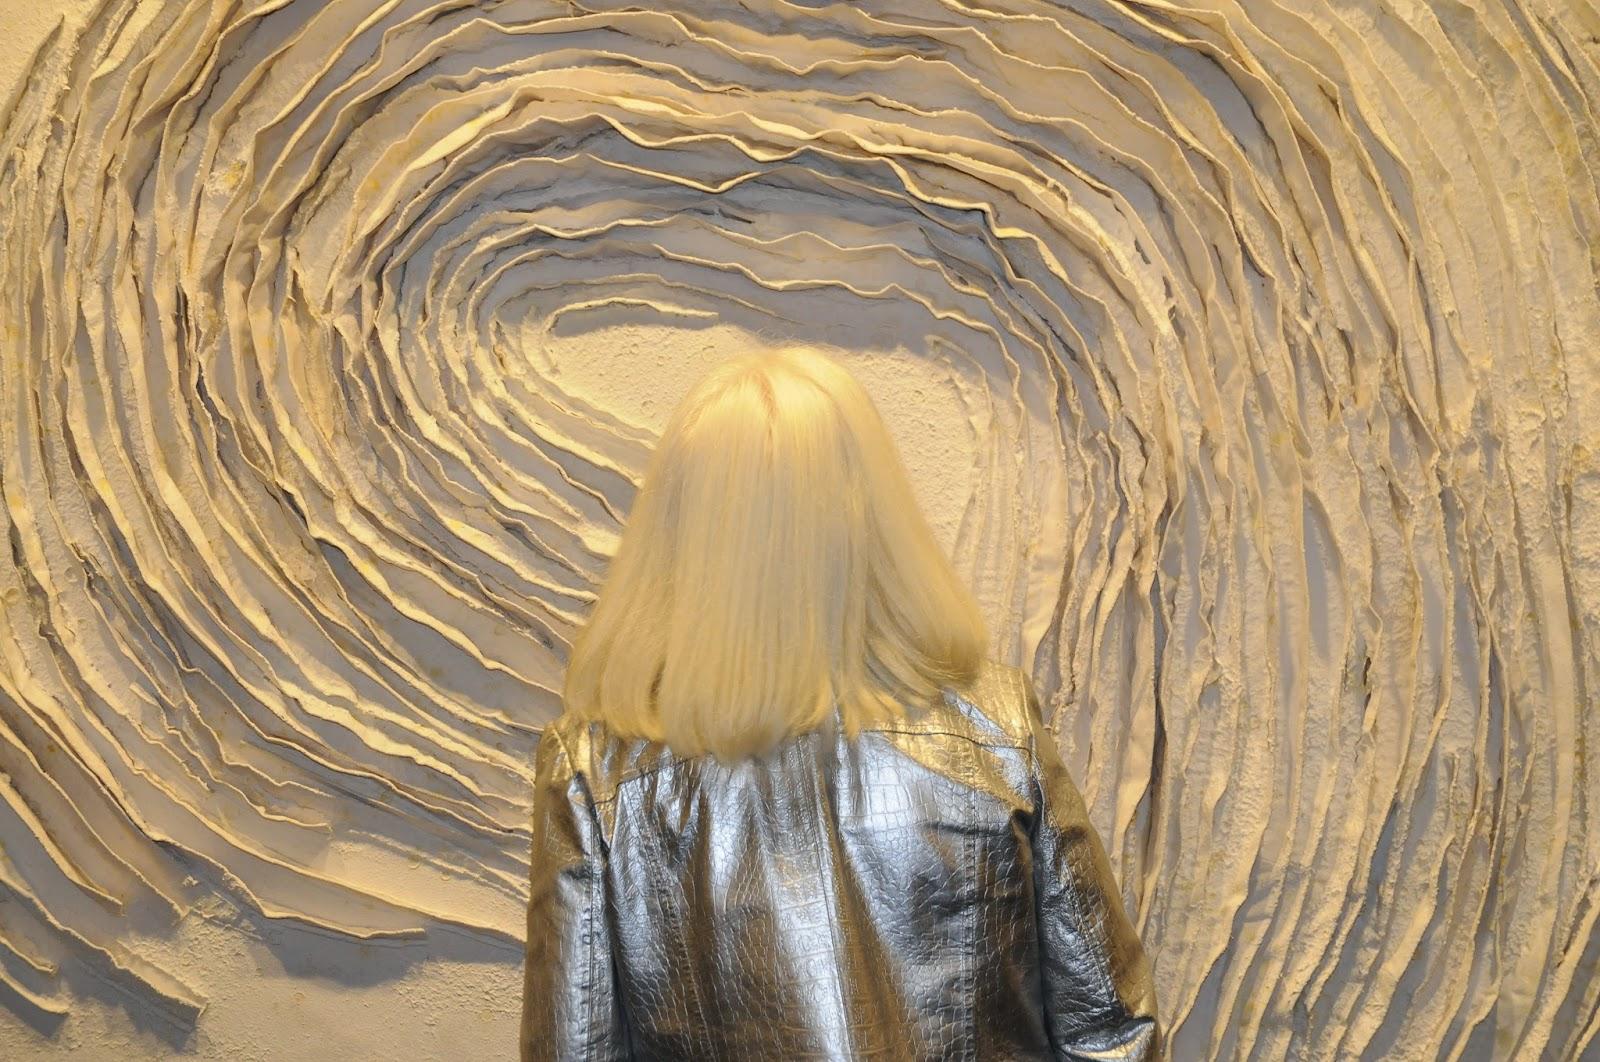 Blog de Arte, Voa-Gallery, Yvonne Brochard, Oscar Serra, Arco,